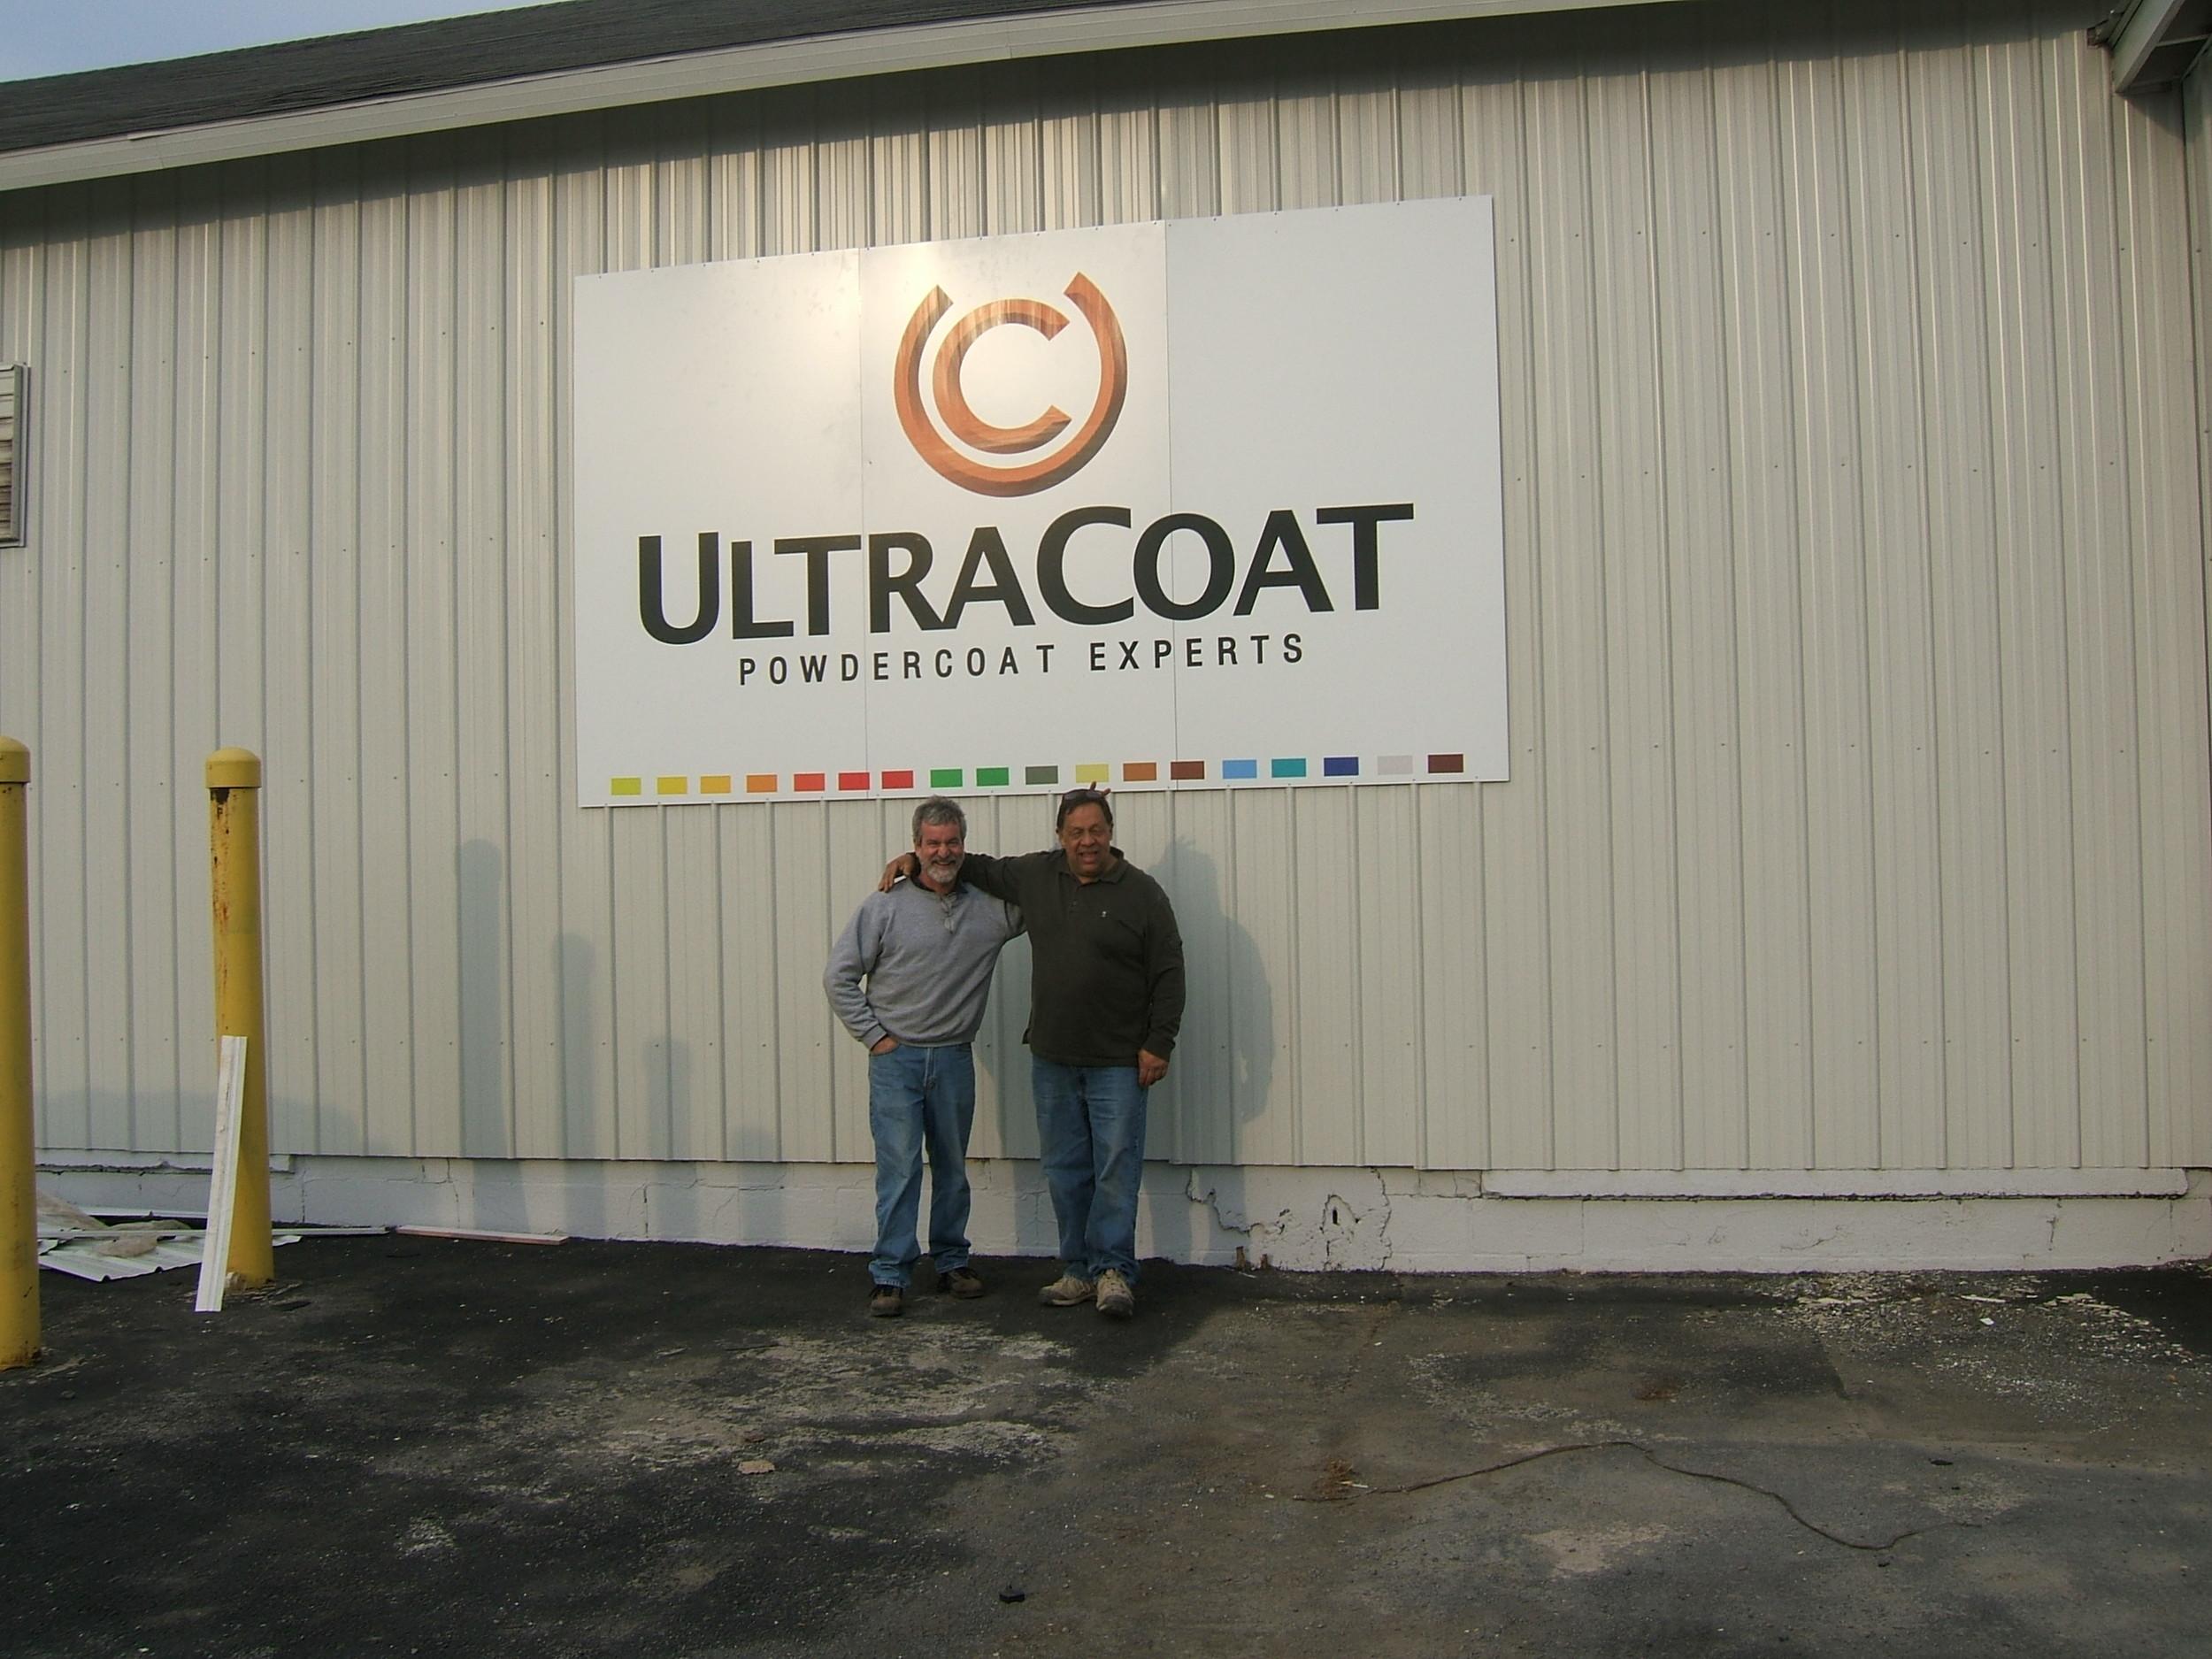 ULTRACOAT 1A.JPG